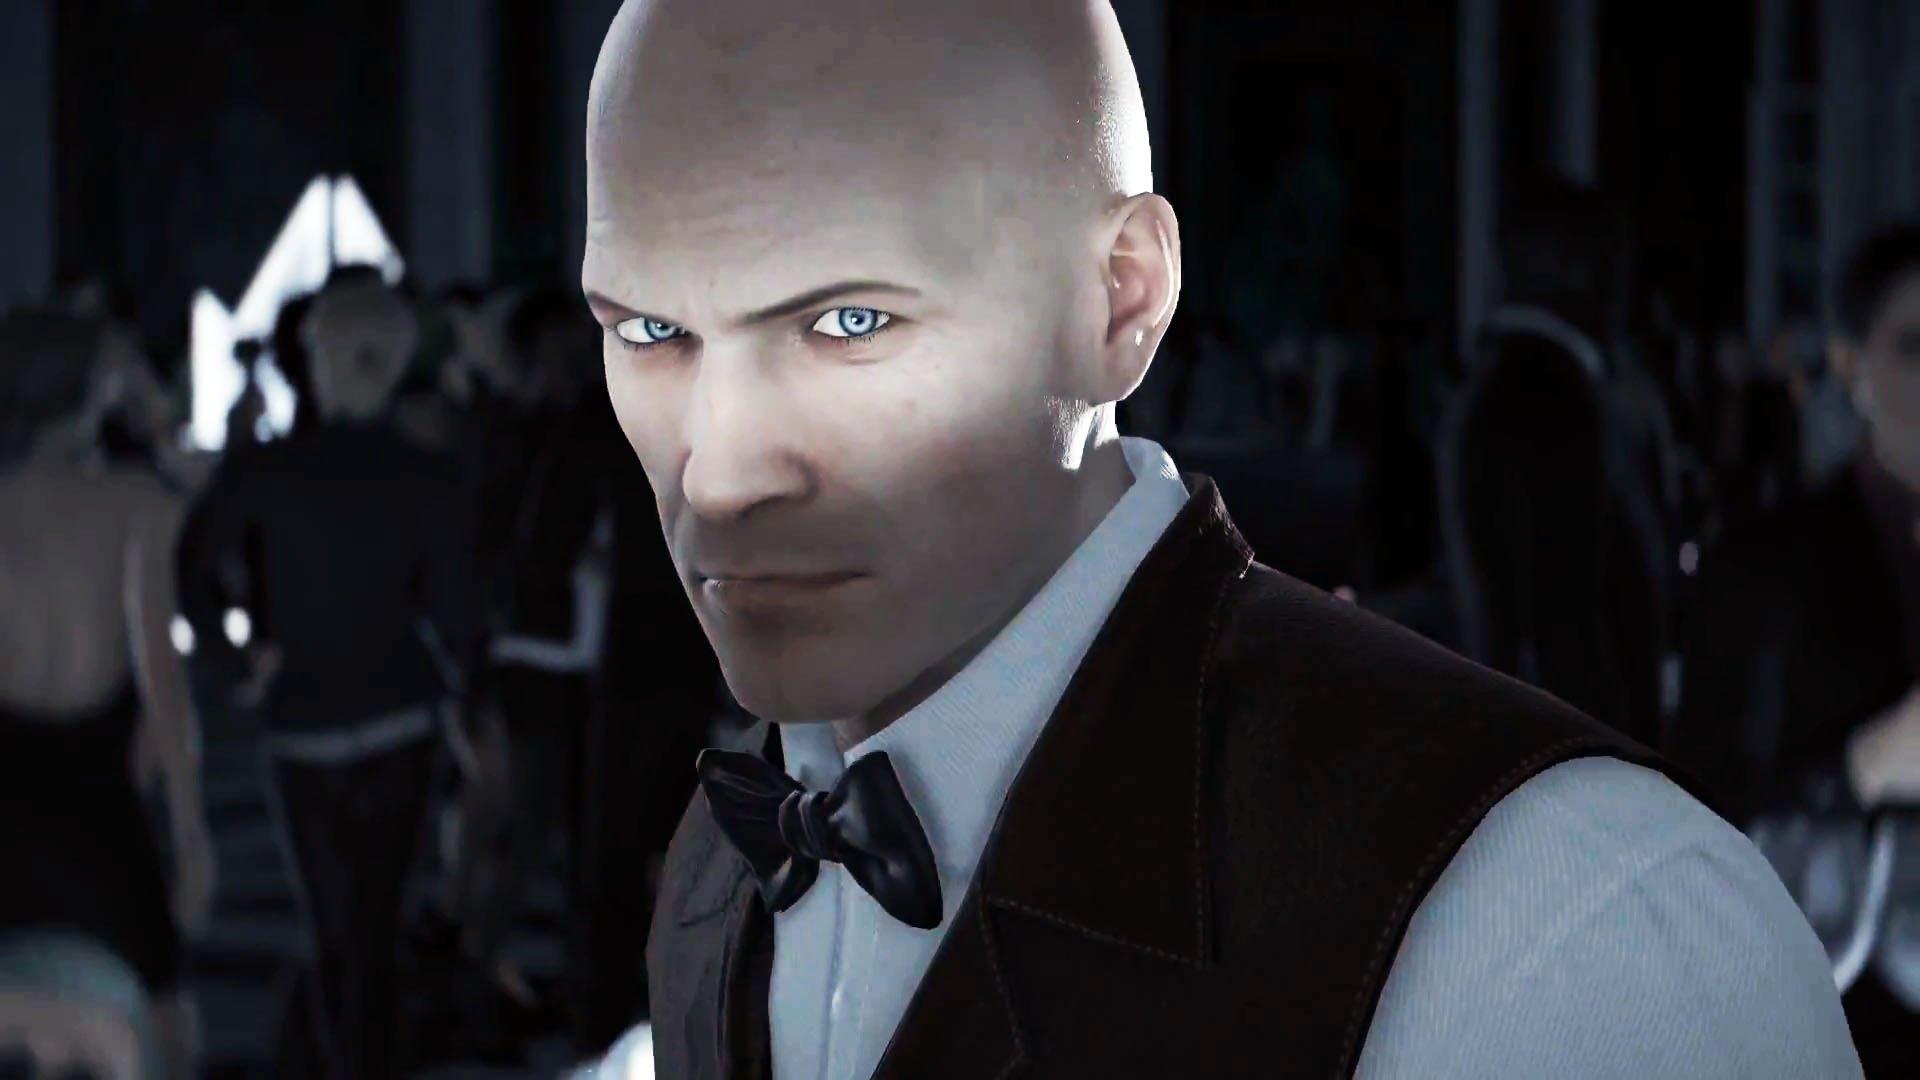 Hitman The Warlord Silent Assassin Guide Playstationgrenade